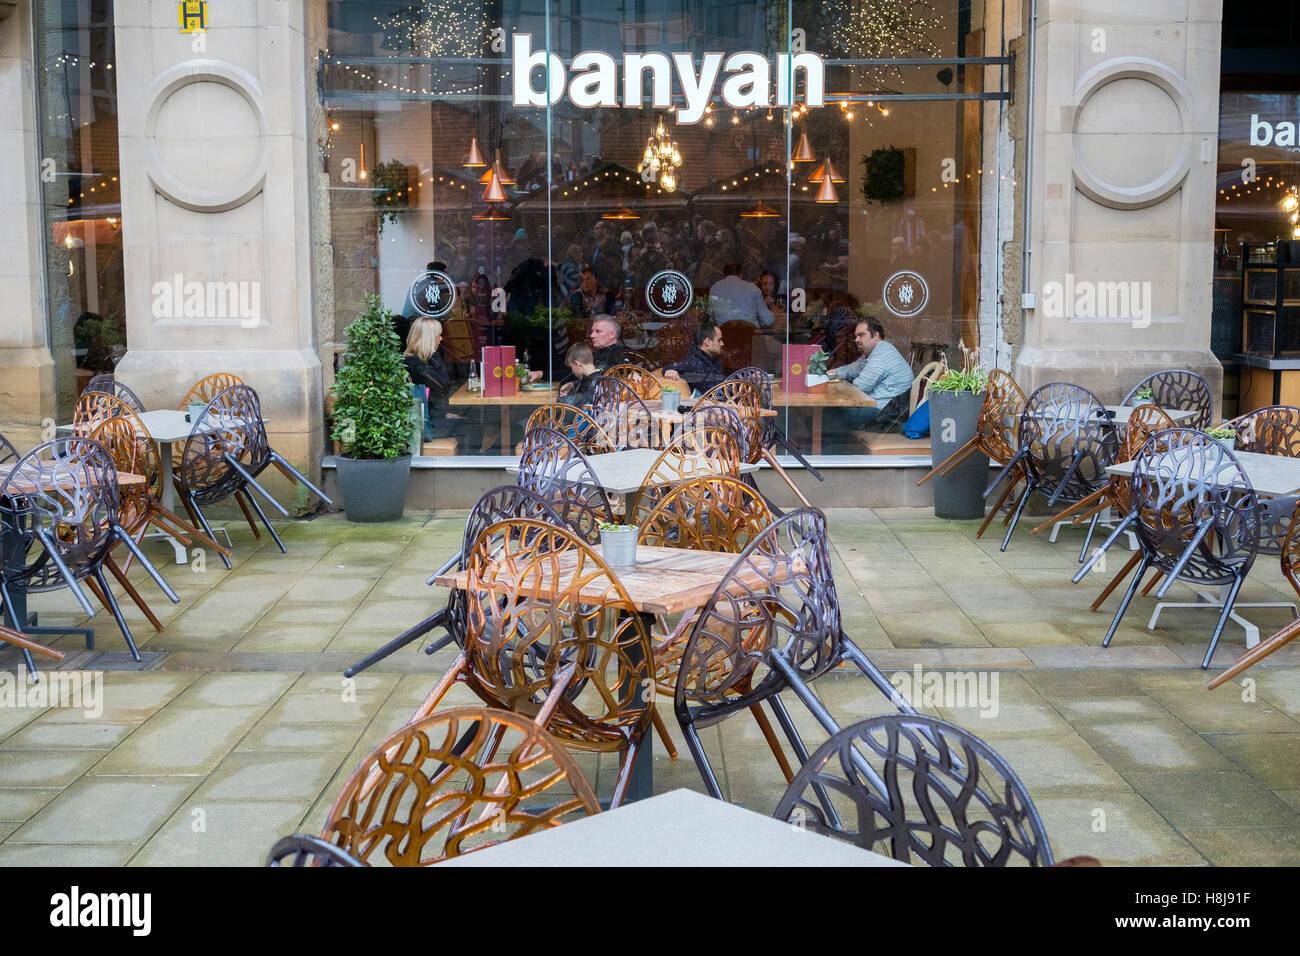 'banyan' restaurant in Manchester city centre, UK. - Stock Image